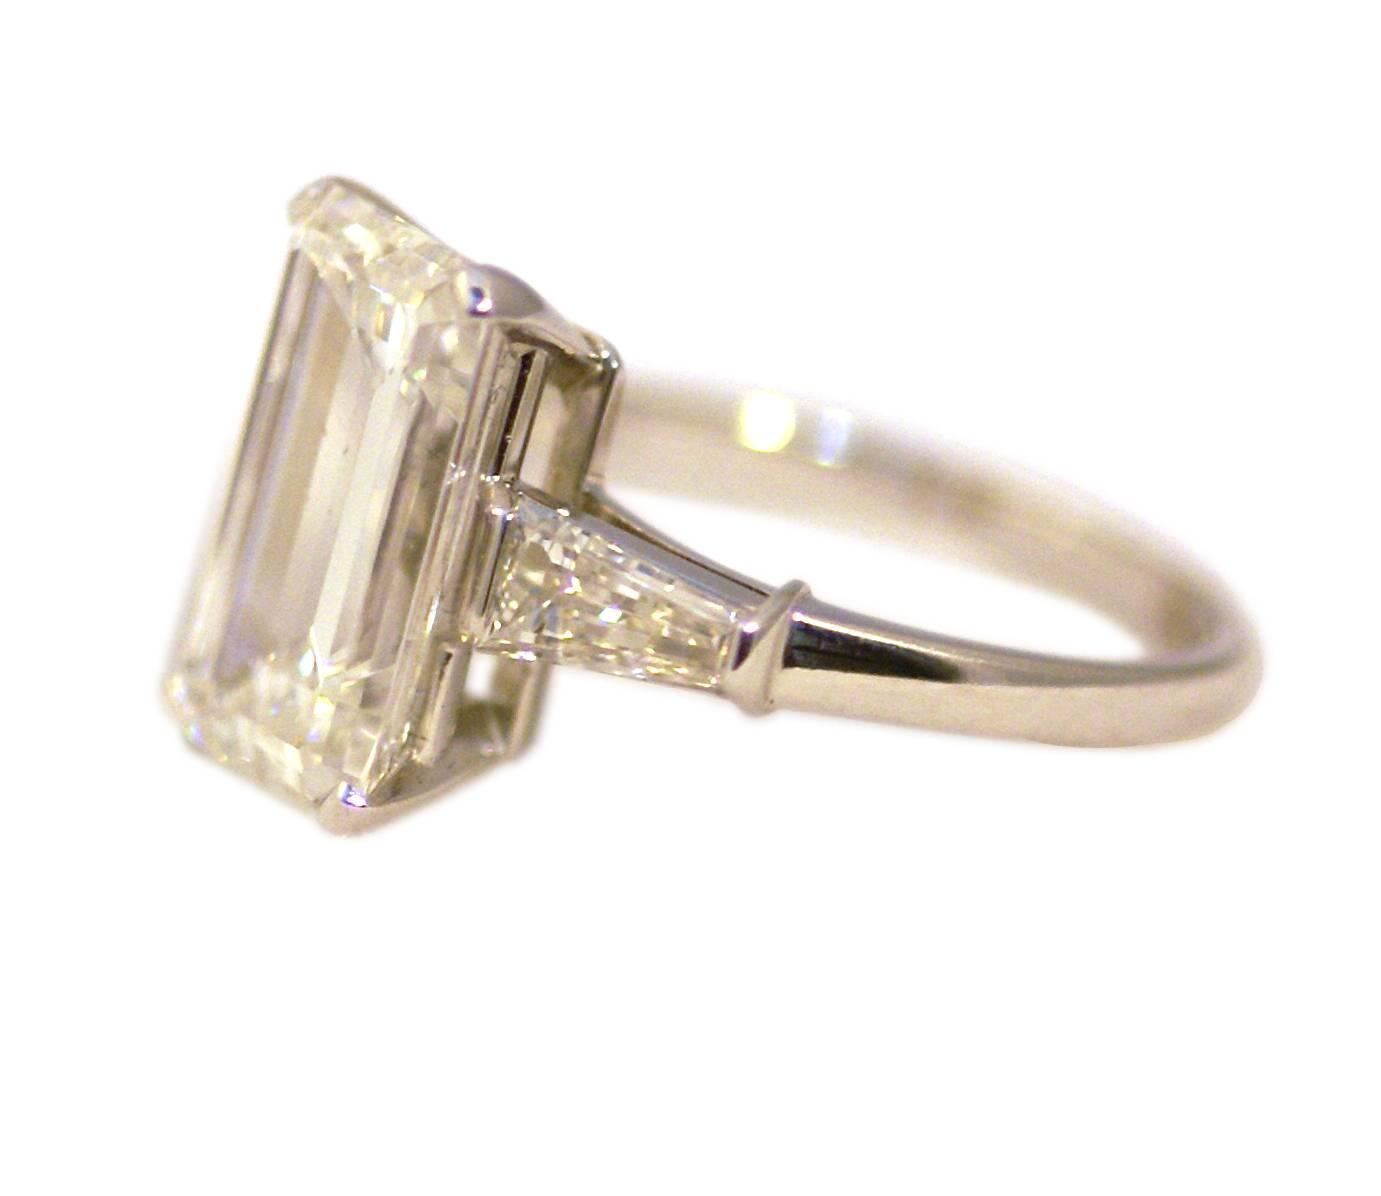 Art deco sapphire rings